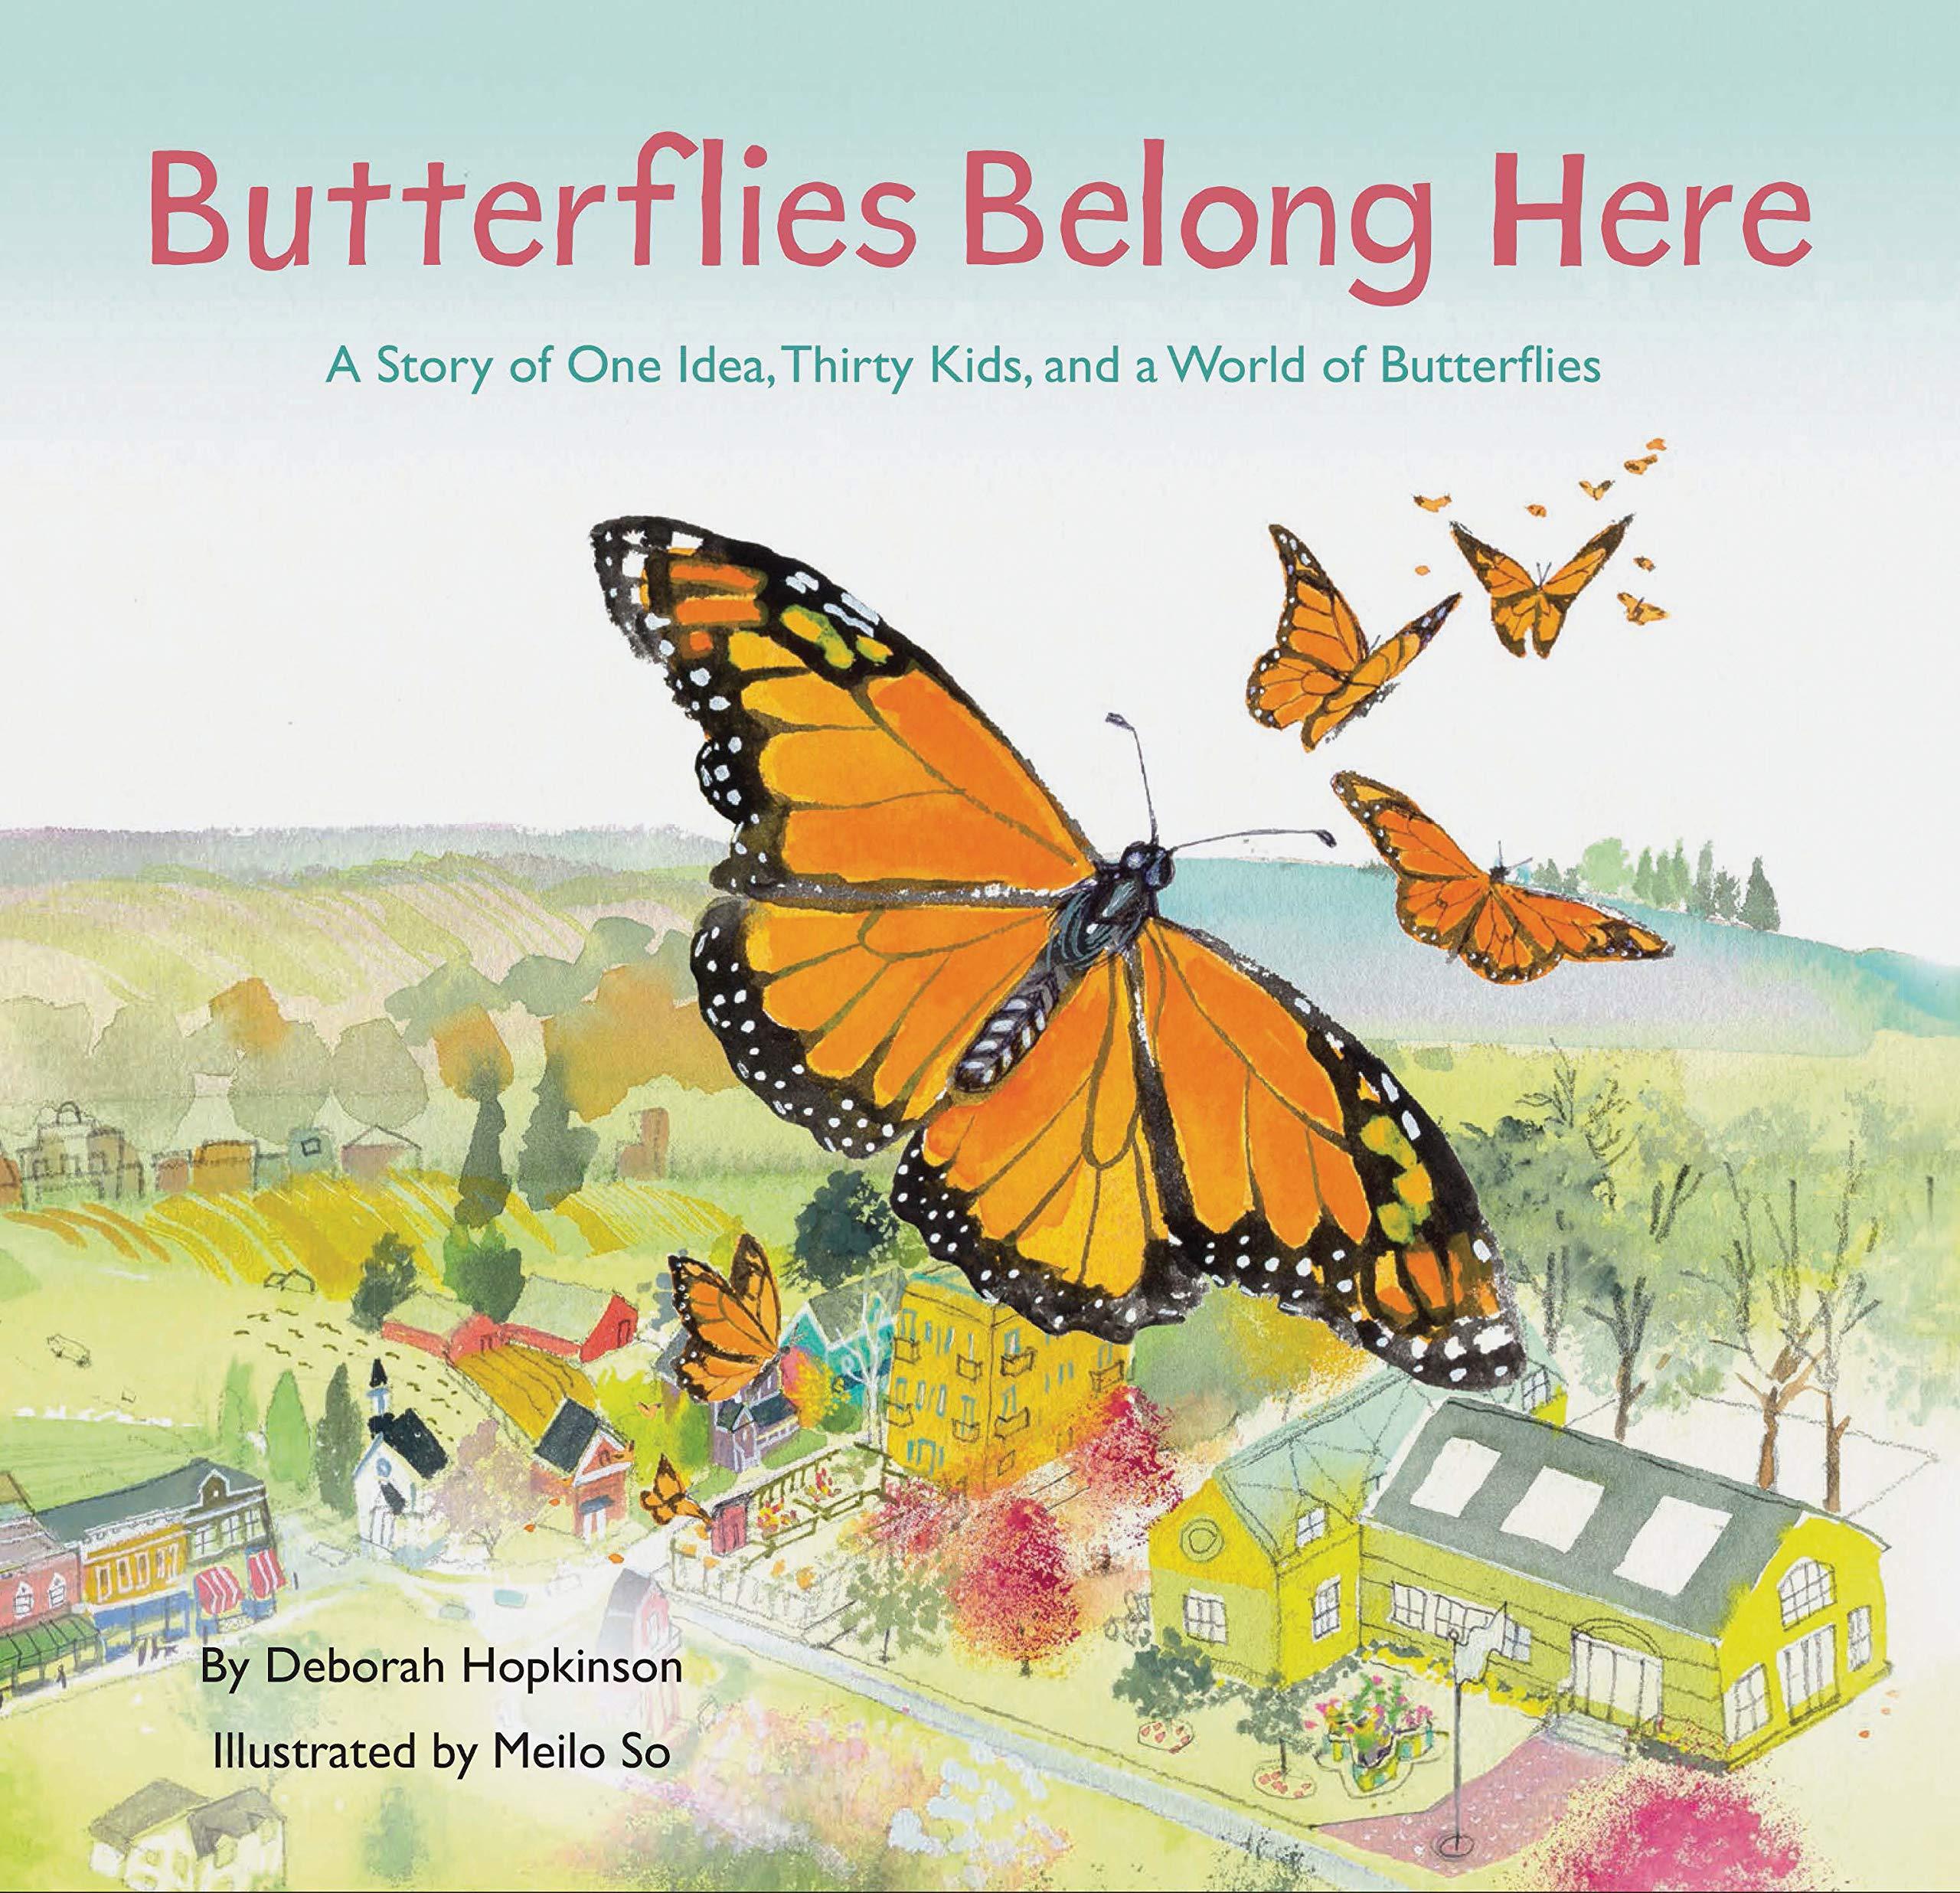 Butterflies Belong Here: A Story of One Idea, Thirty Kids, and a World of  Butterflies: Hopkinson, Deborah, So, Meilo: 9781452176802: Amazon.com: Books